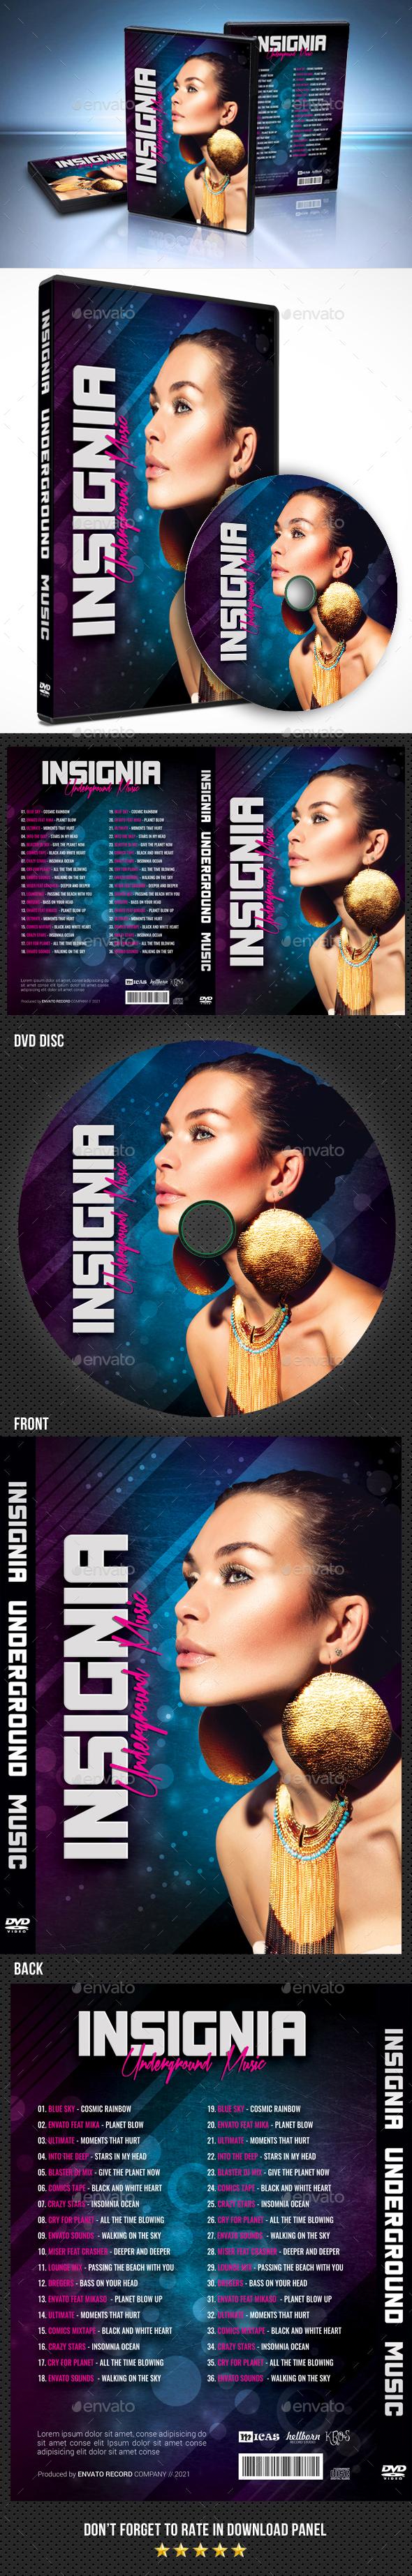 Insignia Underground Music DVD Cover Template